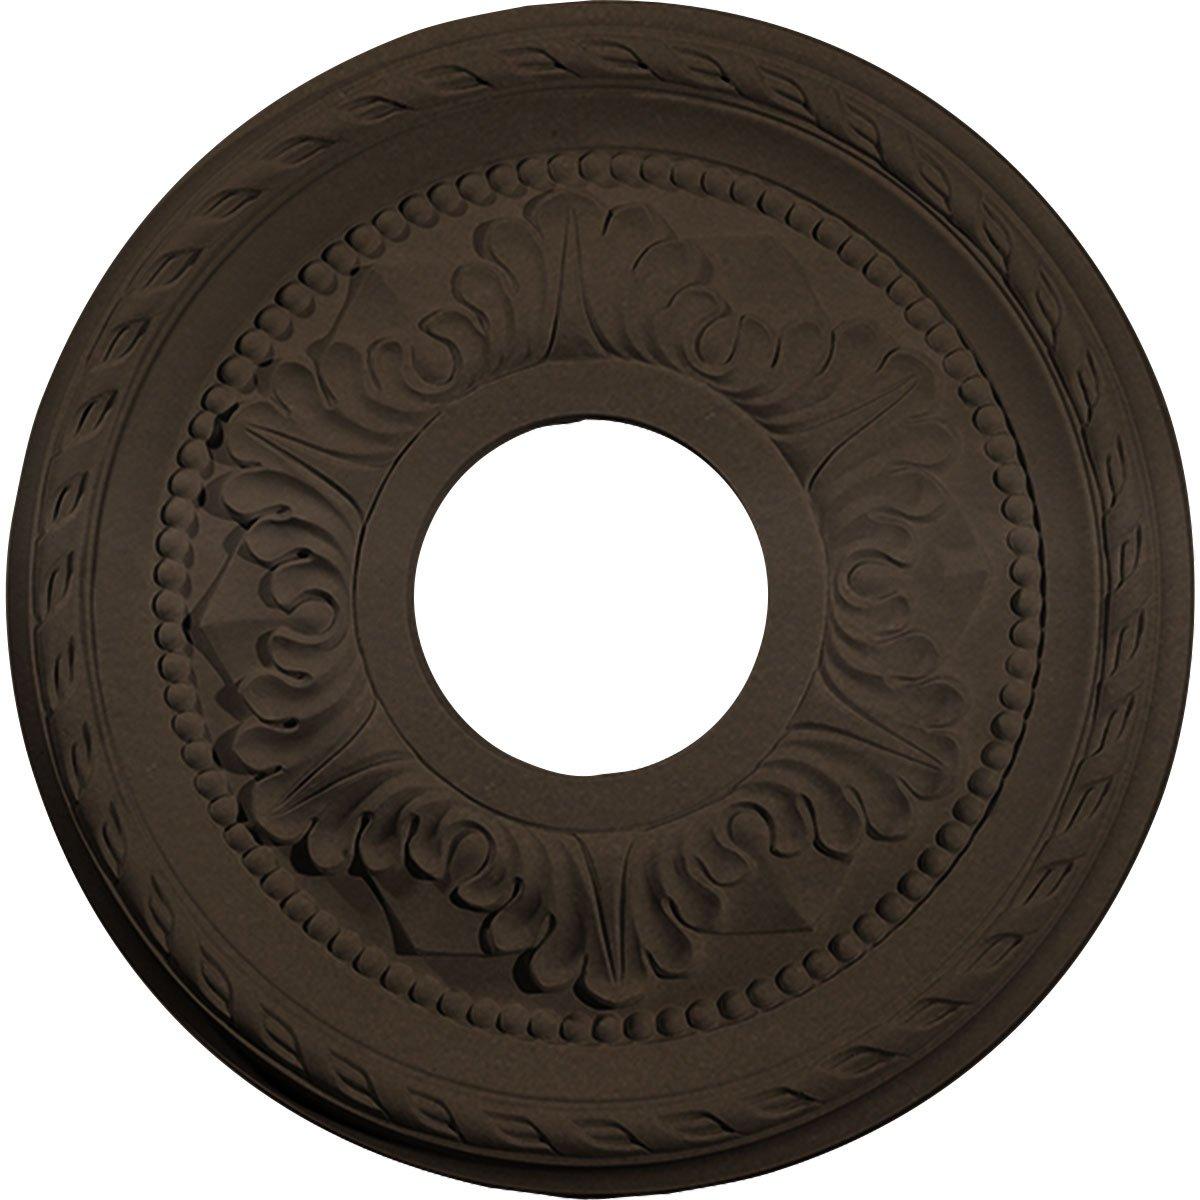 Ekena Millwork CM12PMBZS Ceiling Medallion 12 1/8'' OD x 3 1/2'' ID x 1'' P Palmetto (fits Canopies up to 4 7/8''), Bronze by Ekena Millwork